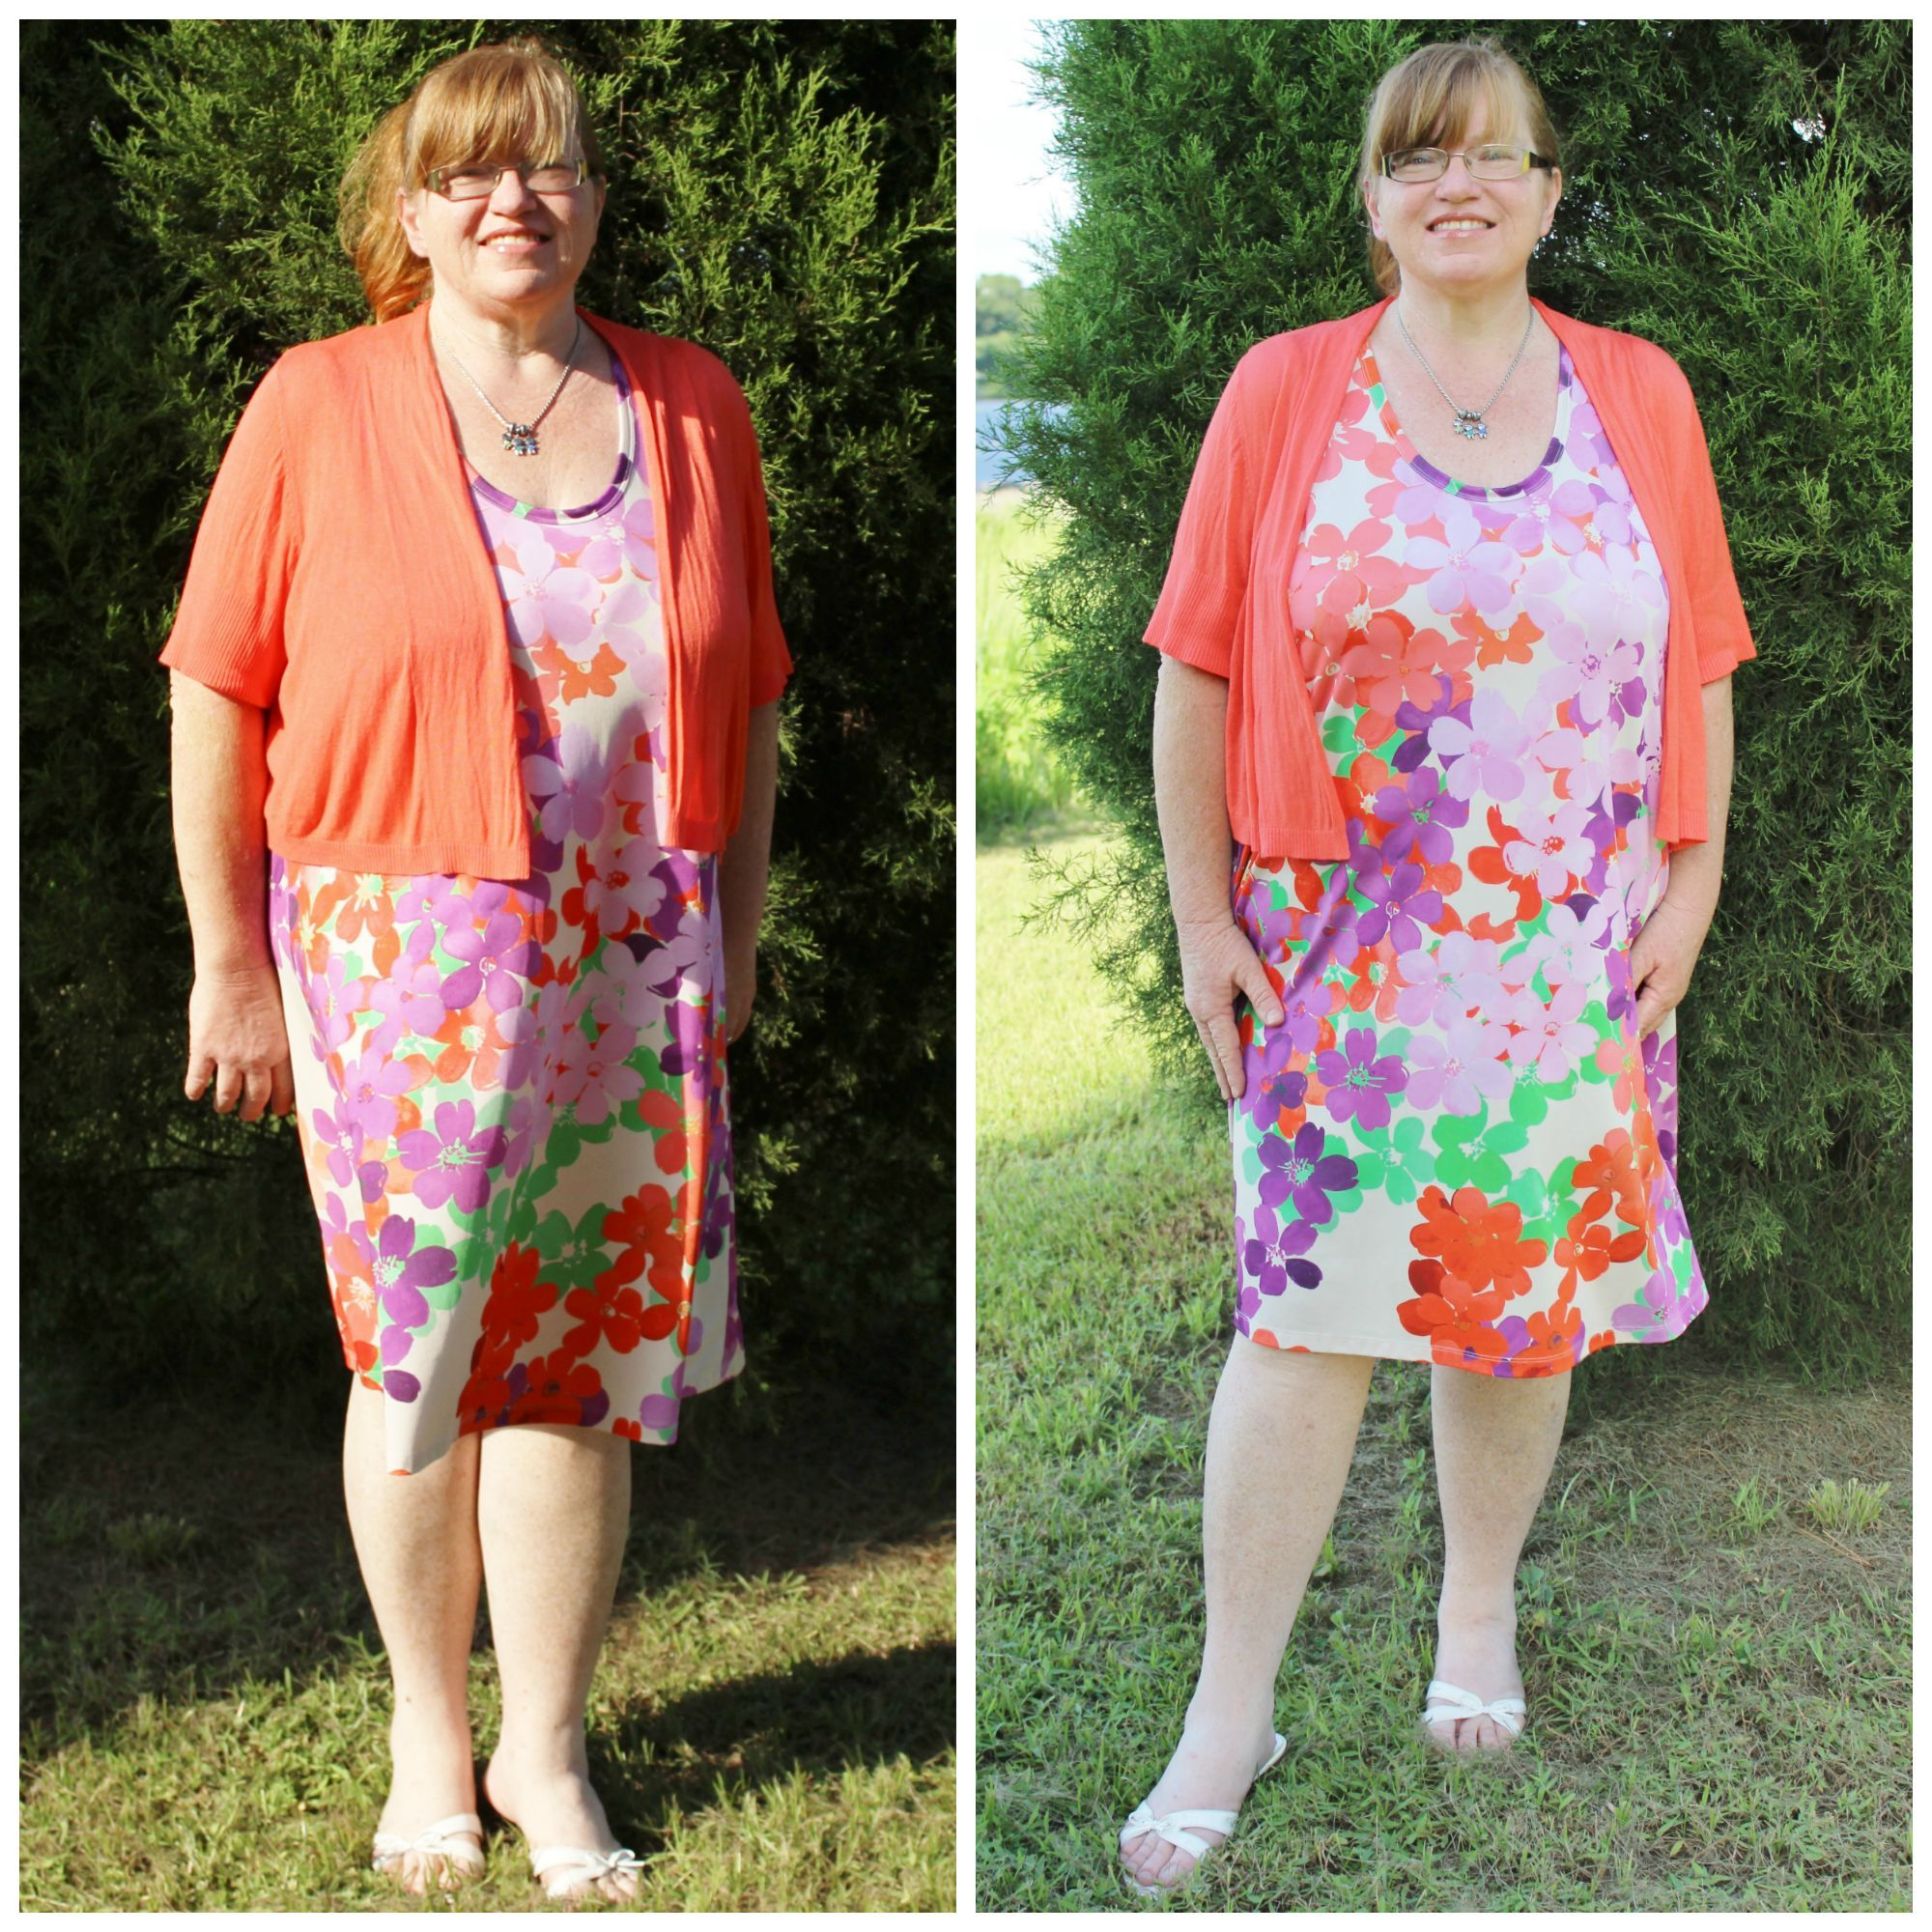 PAINTED GARDEN TANK DRESS #GwynnieBee #ShareMeGB